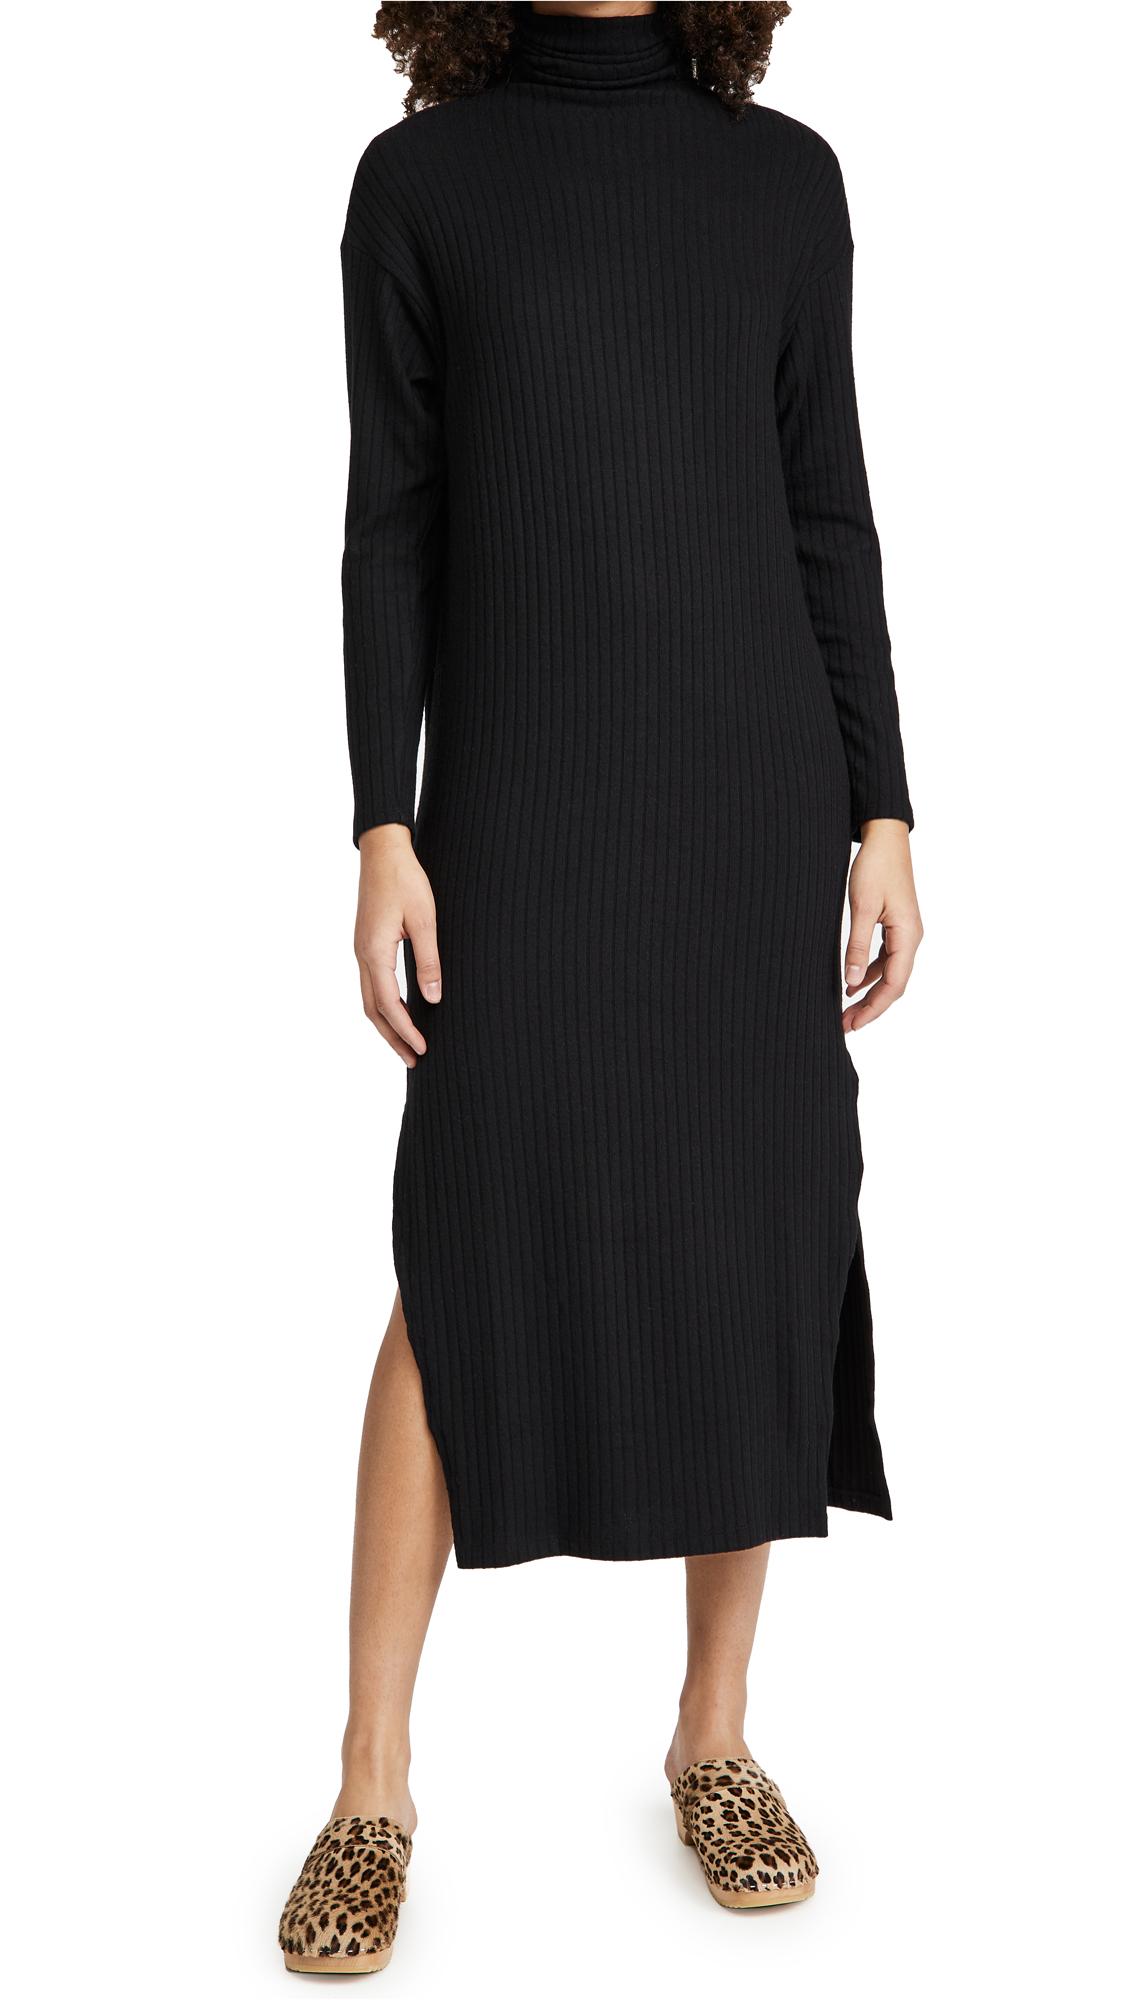 Enza Costa Turtleneck Dress